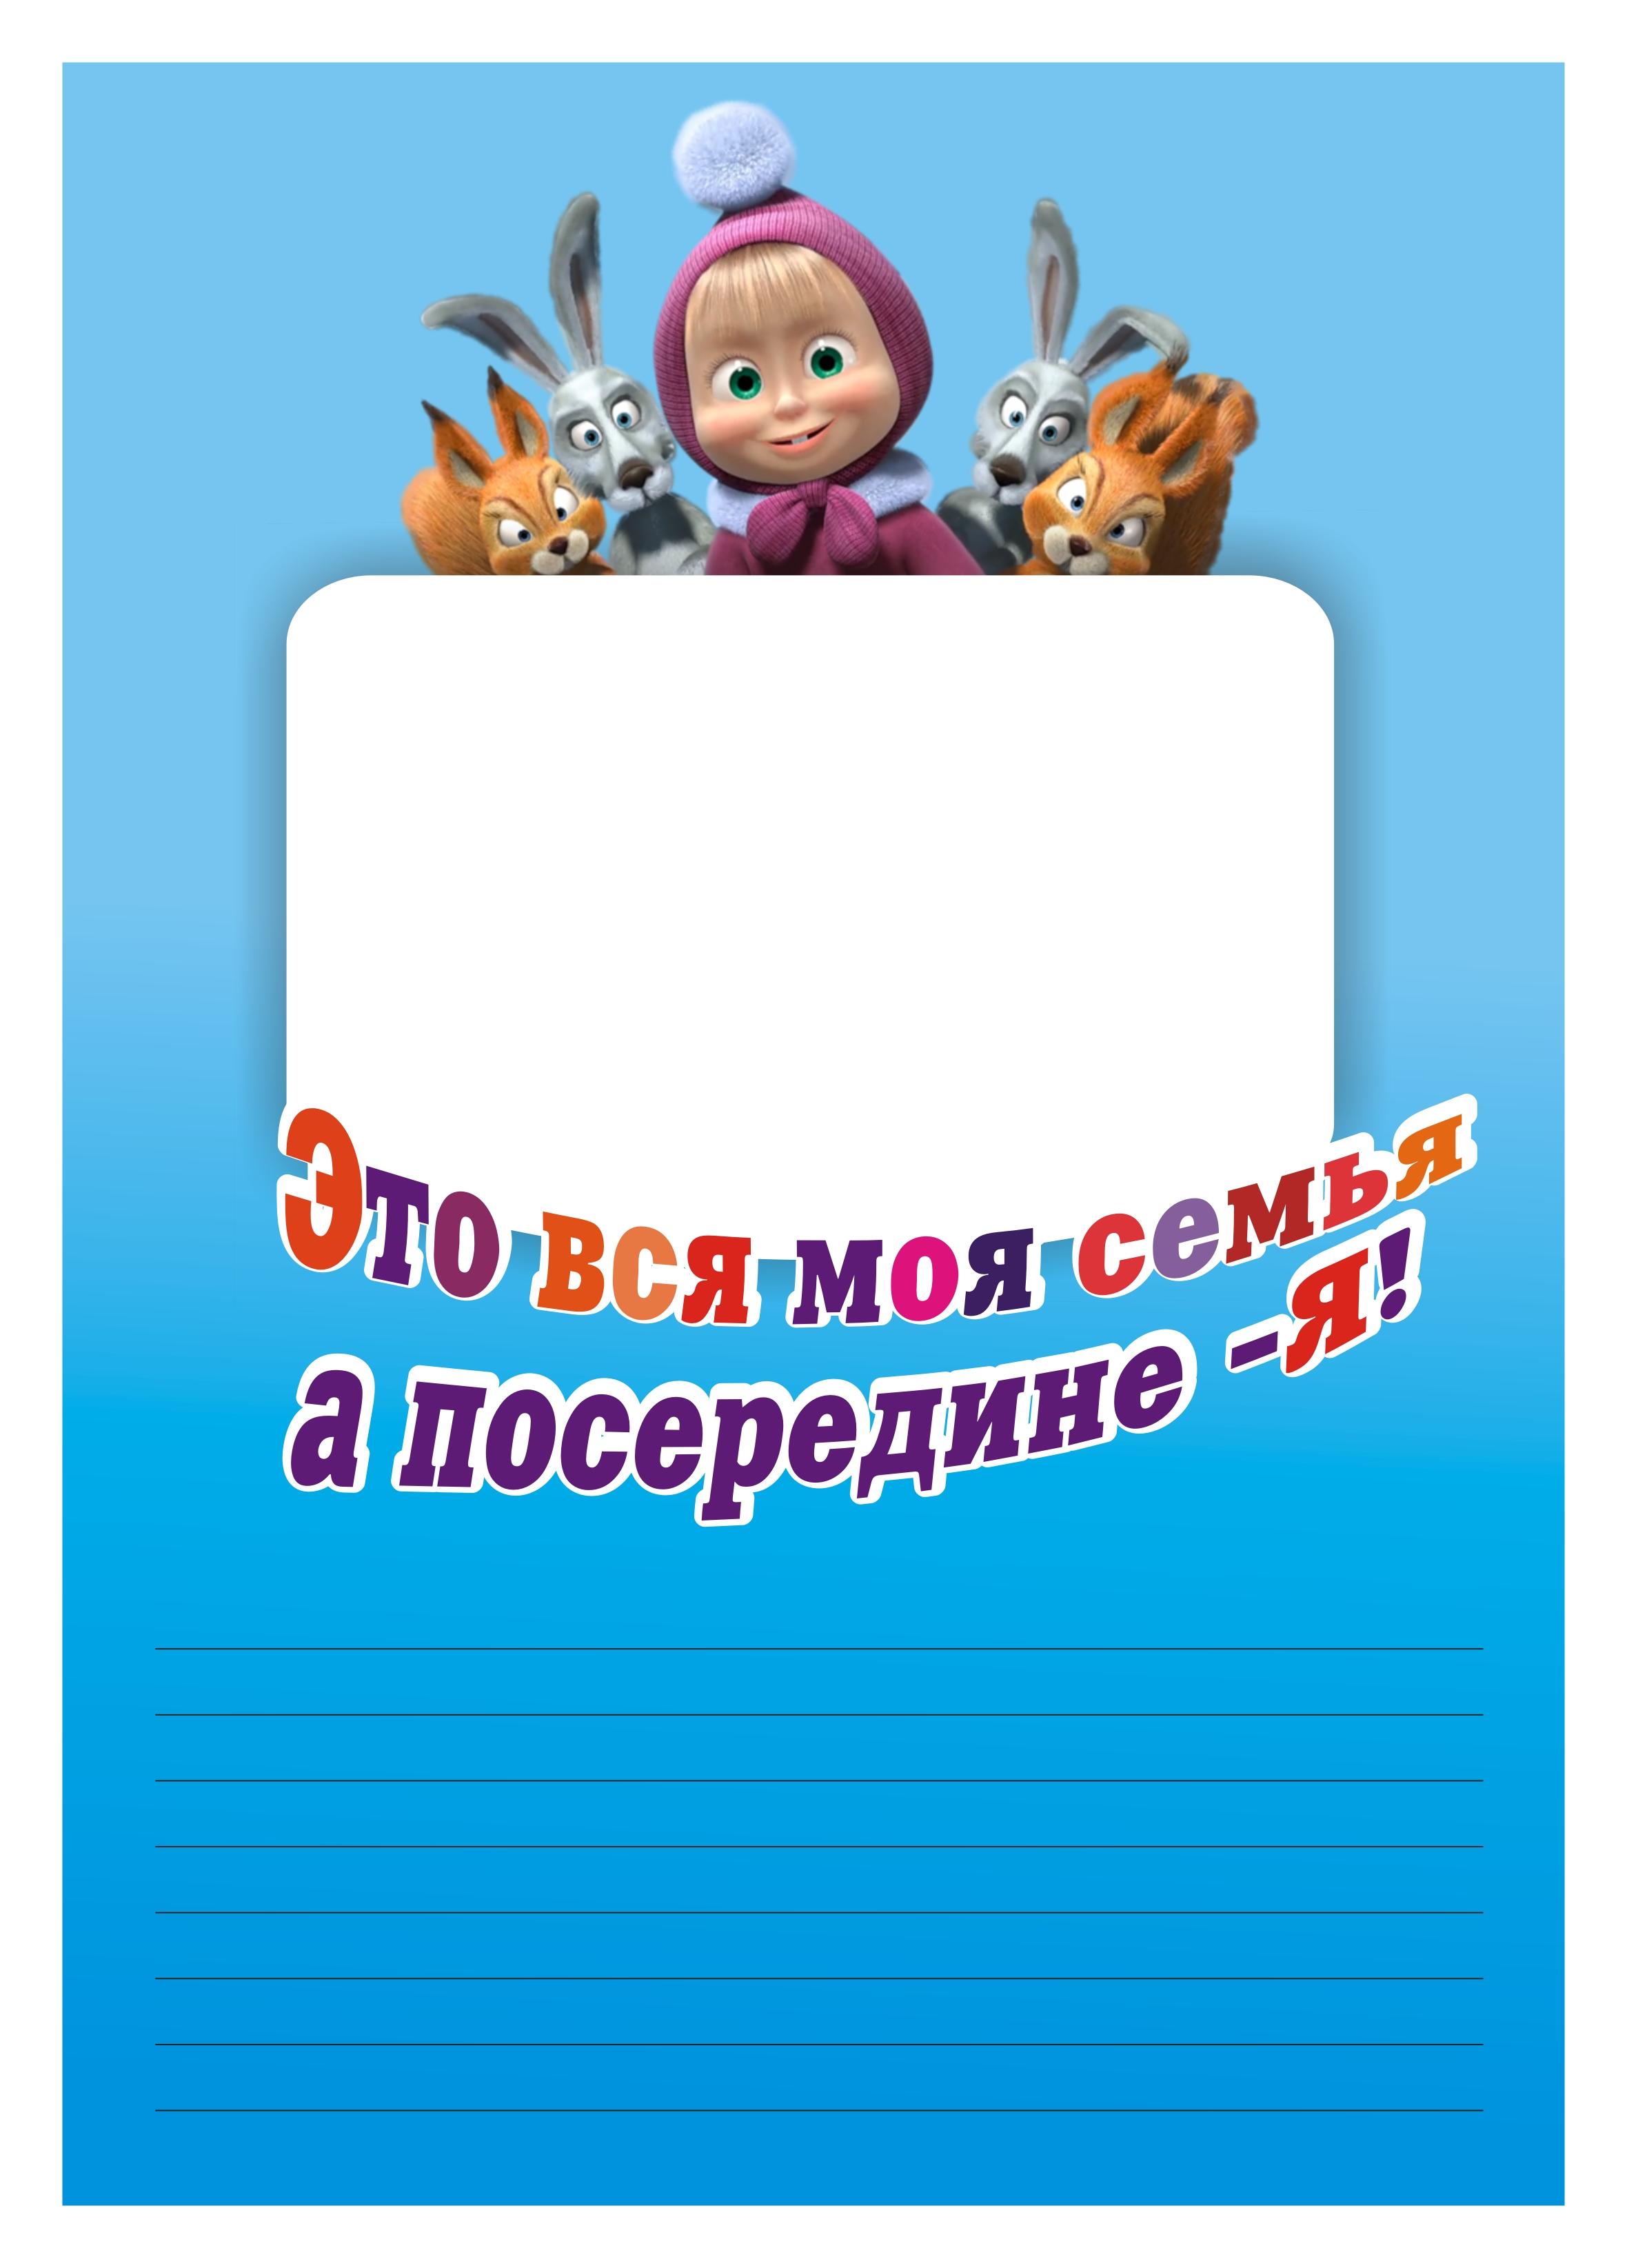 Переадресация вызова прао вф украина - мтс